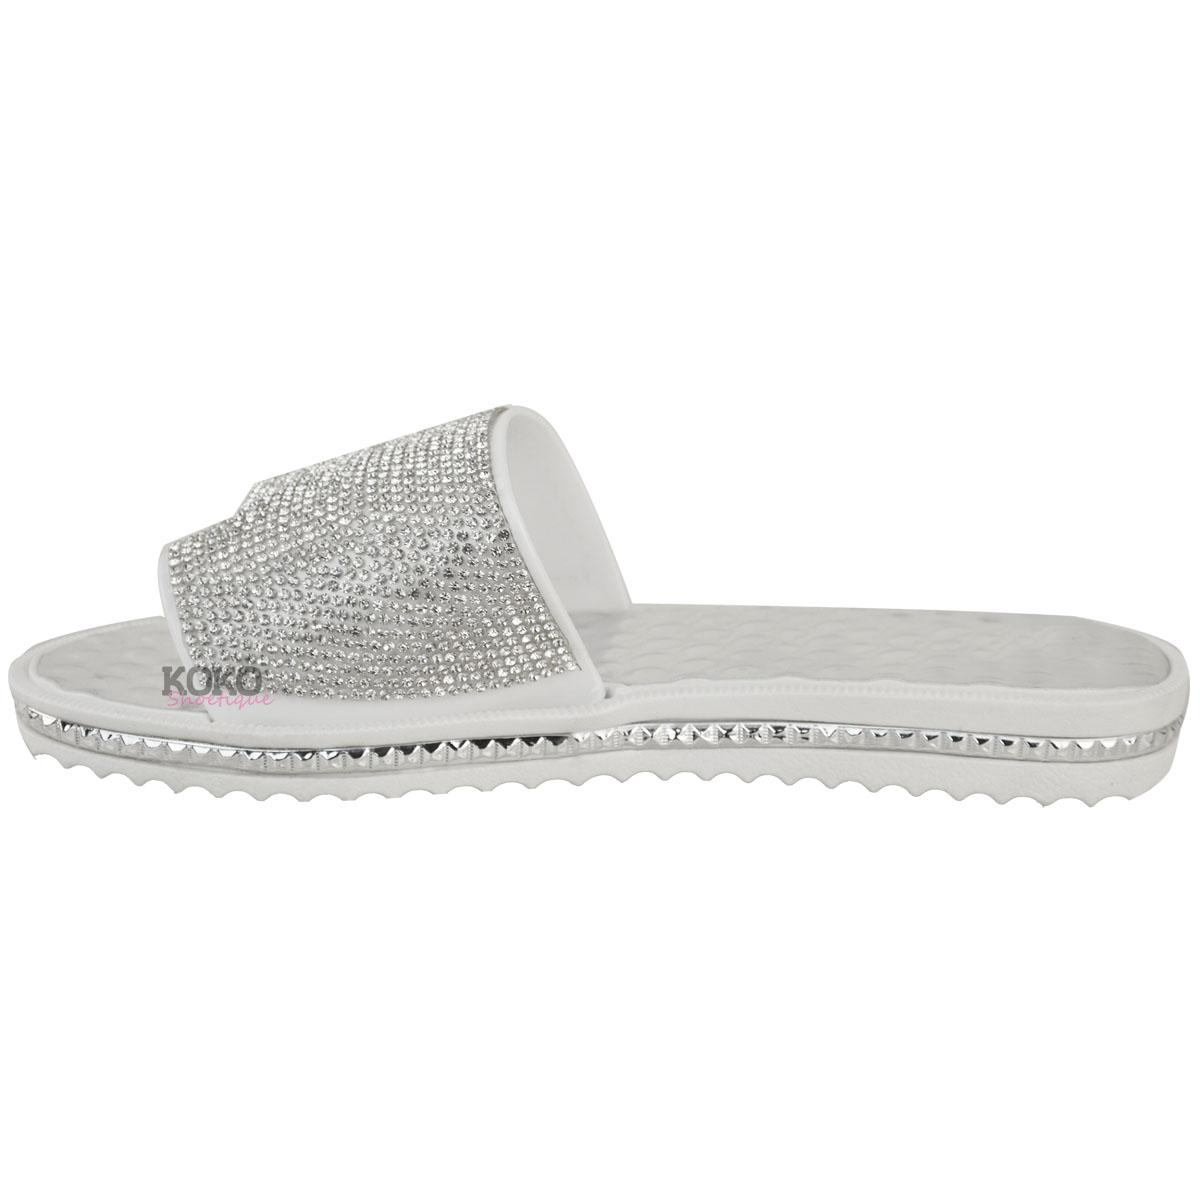 4b196cabd Womens Ladies Flat Diamante Beach Holiday Casual Sandals Summer Low ...